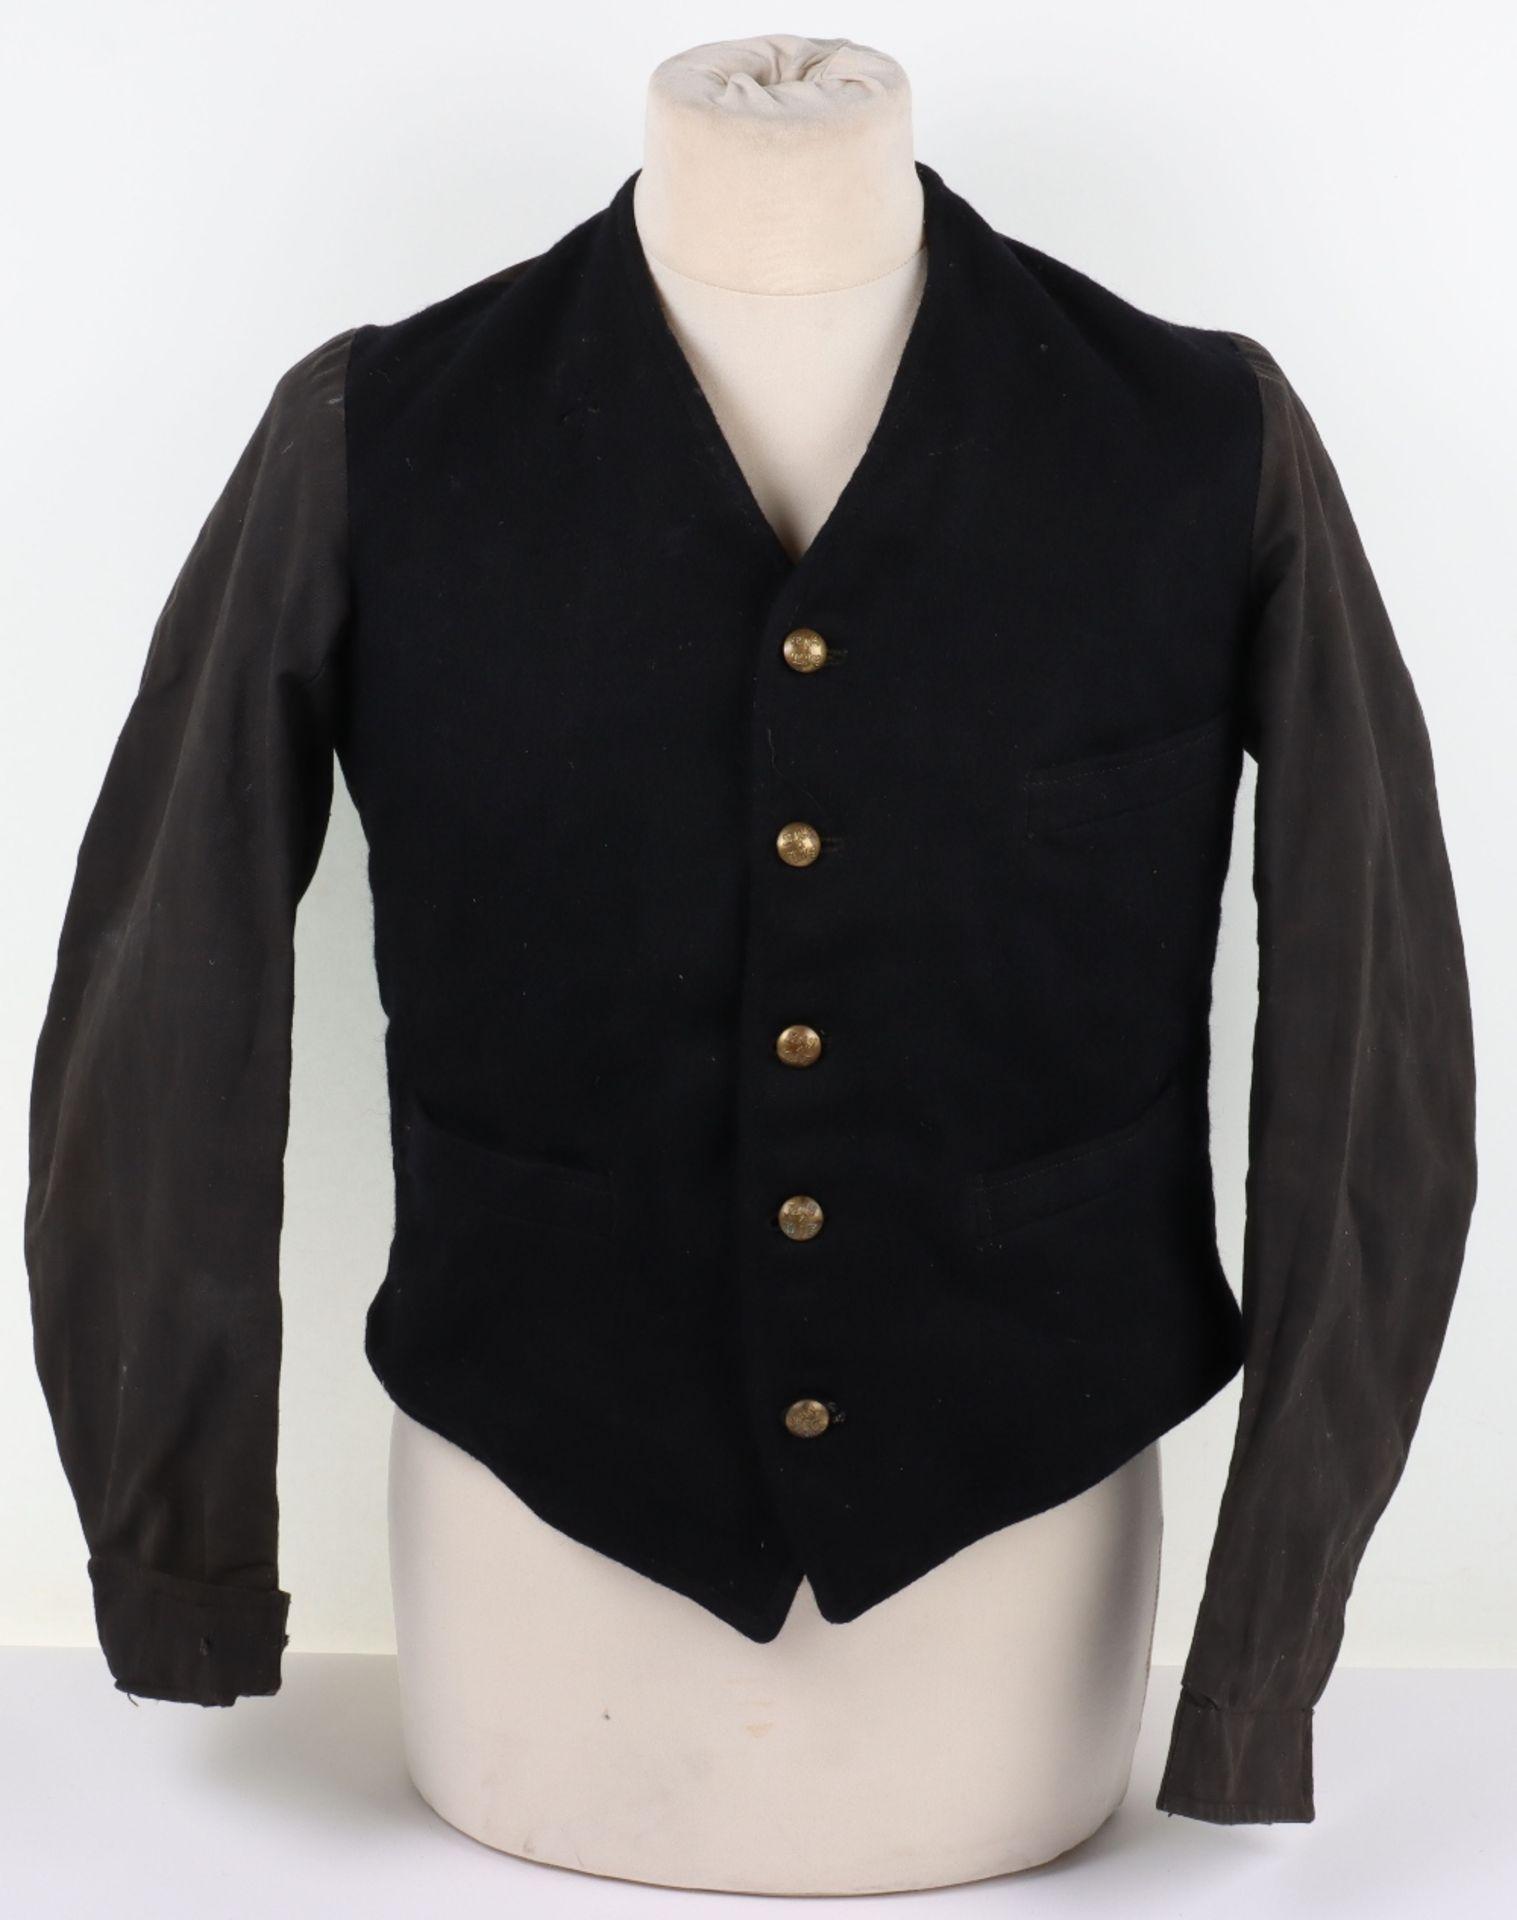 A London, Midland & Scottish and London North Eastern Railway porter's jacket, circa 1930 - Image 2 of 13